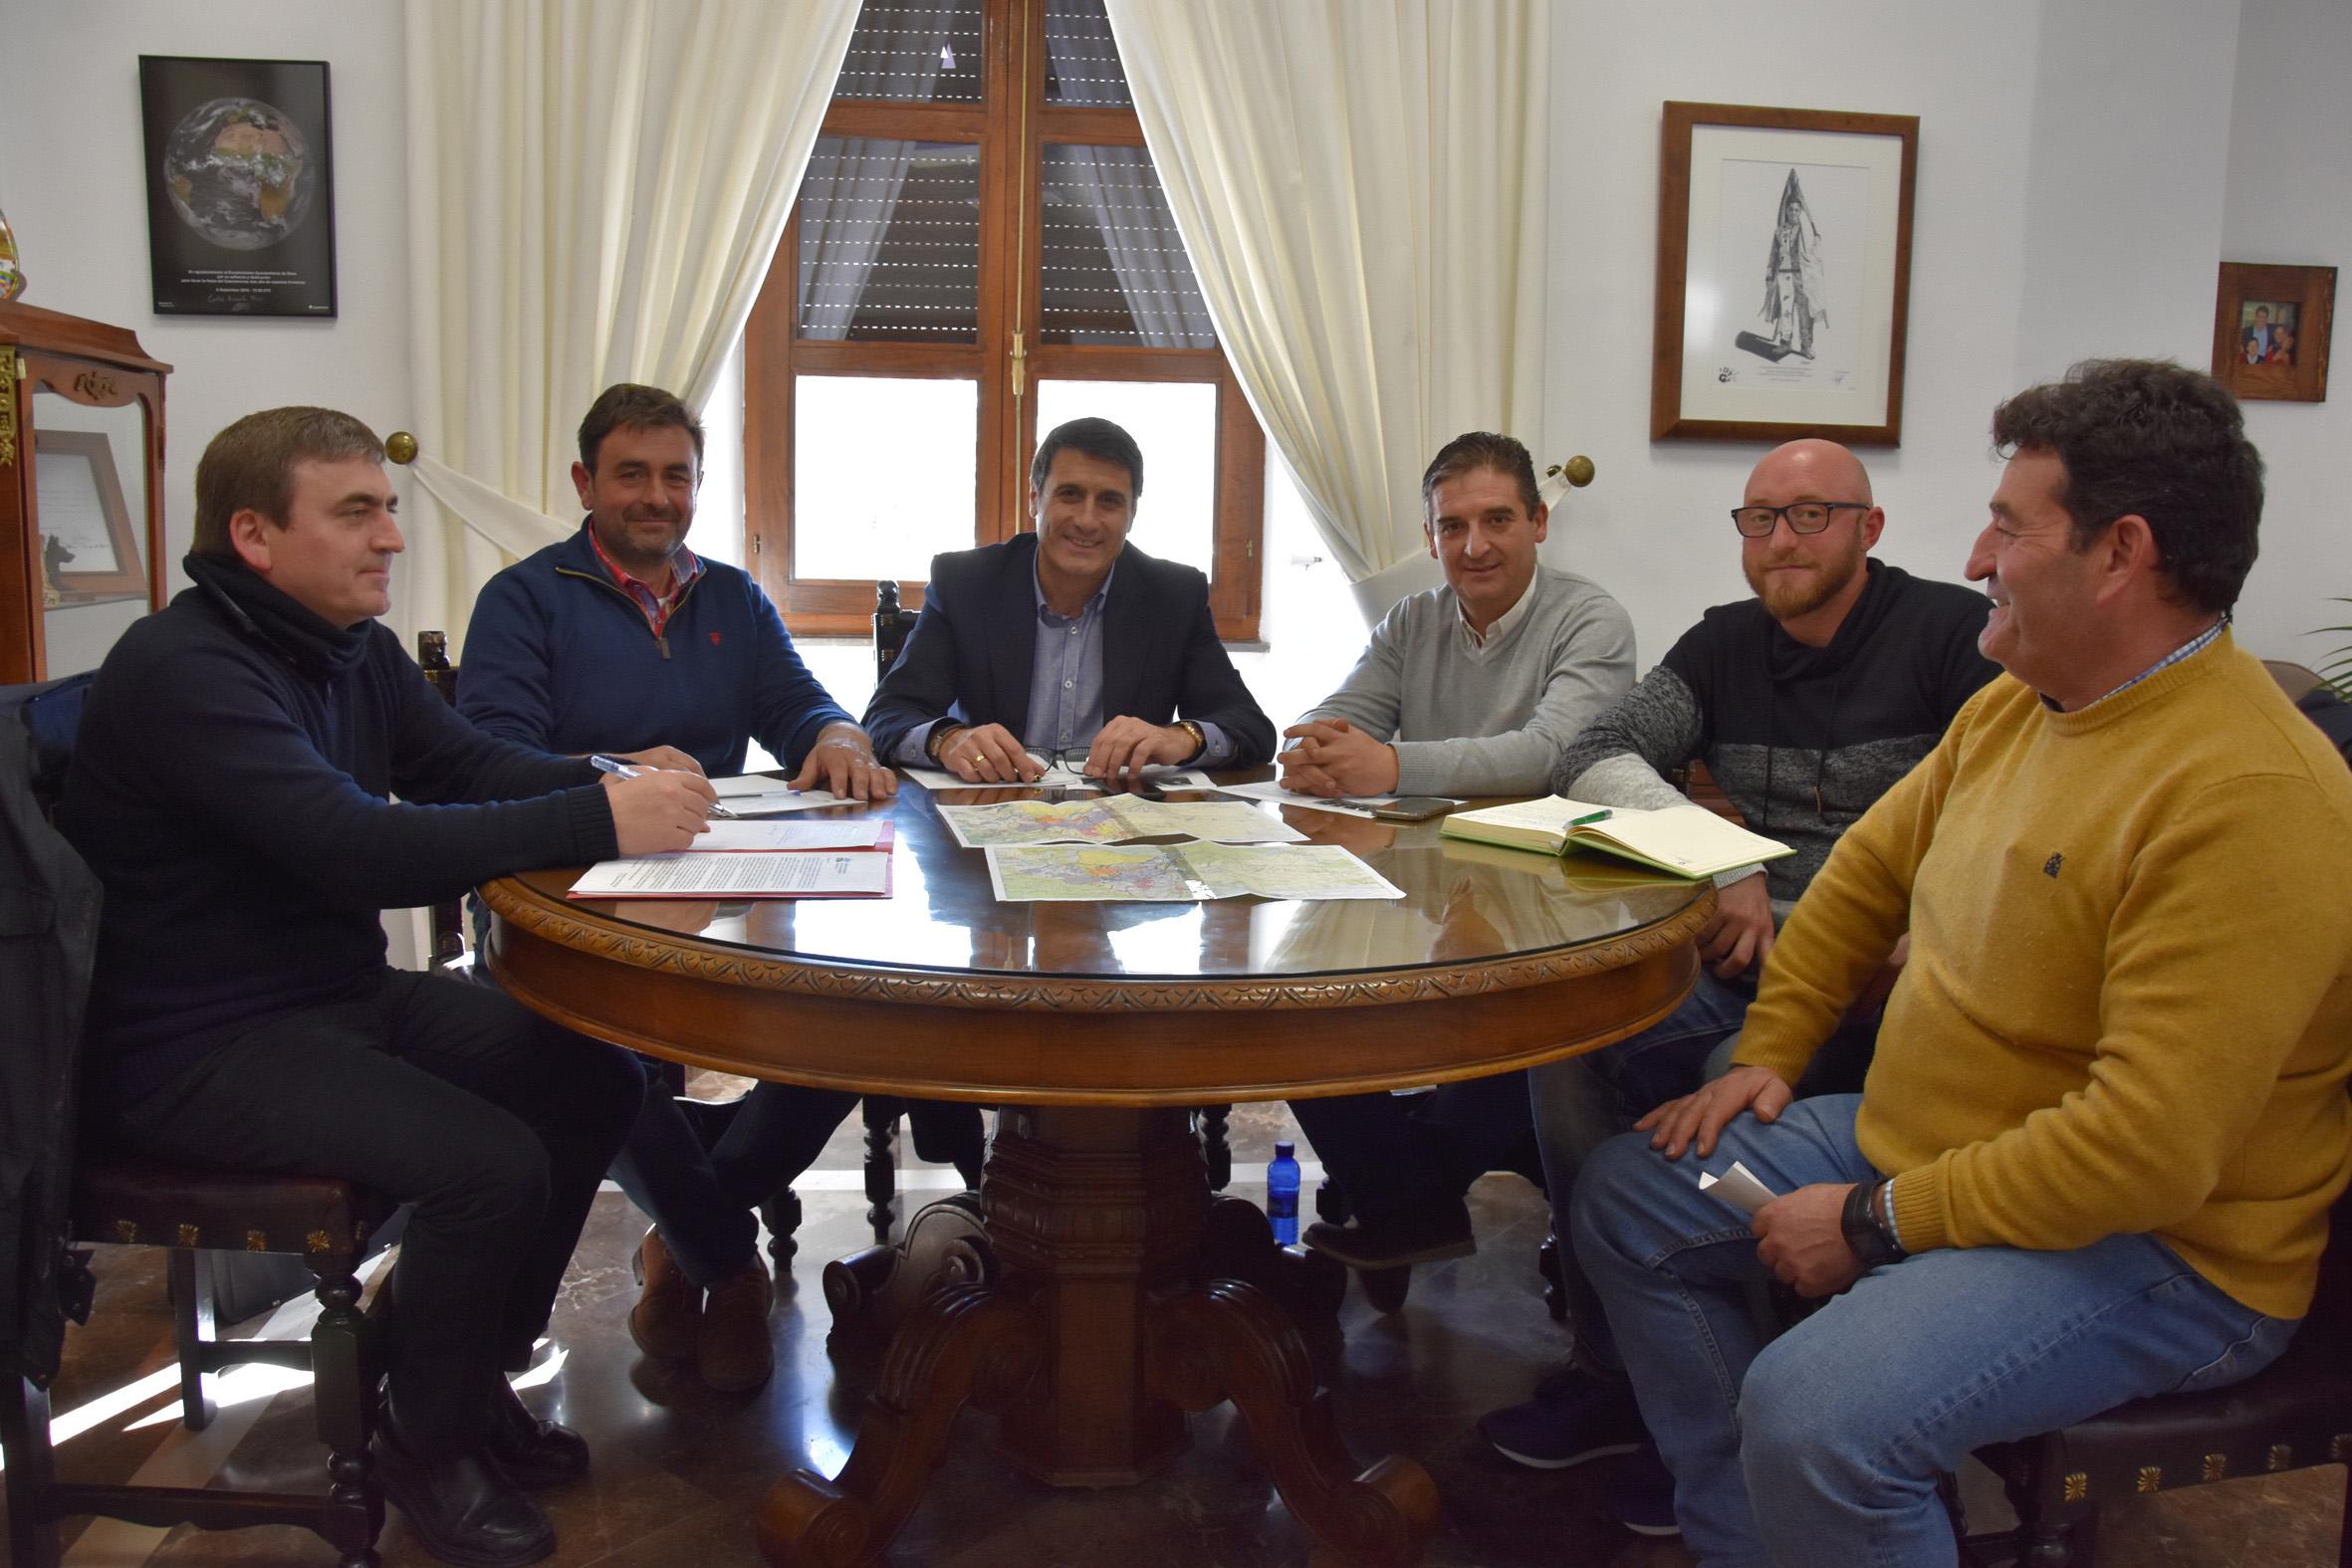 reunion 7fuentes alcalde2w